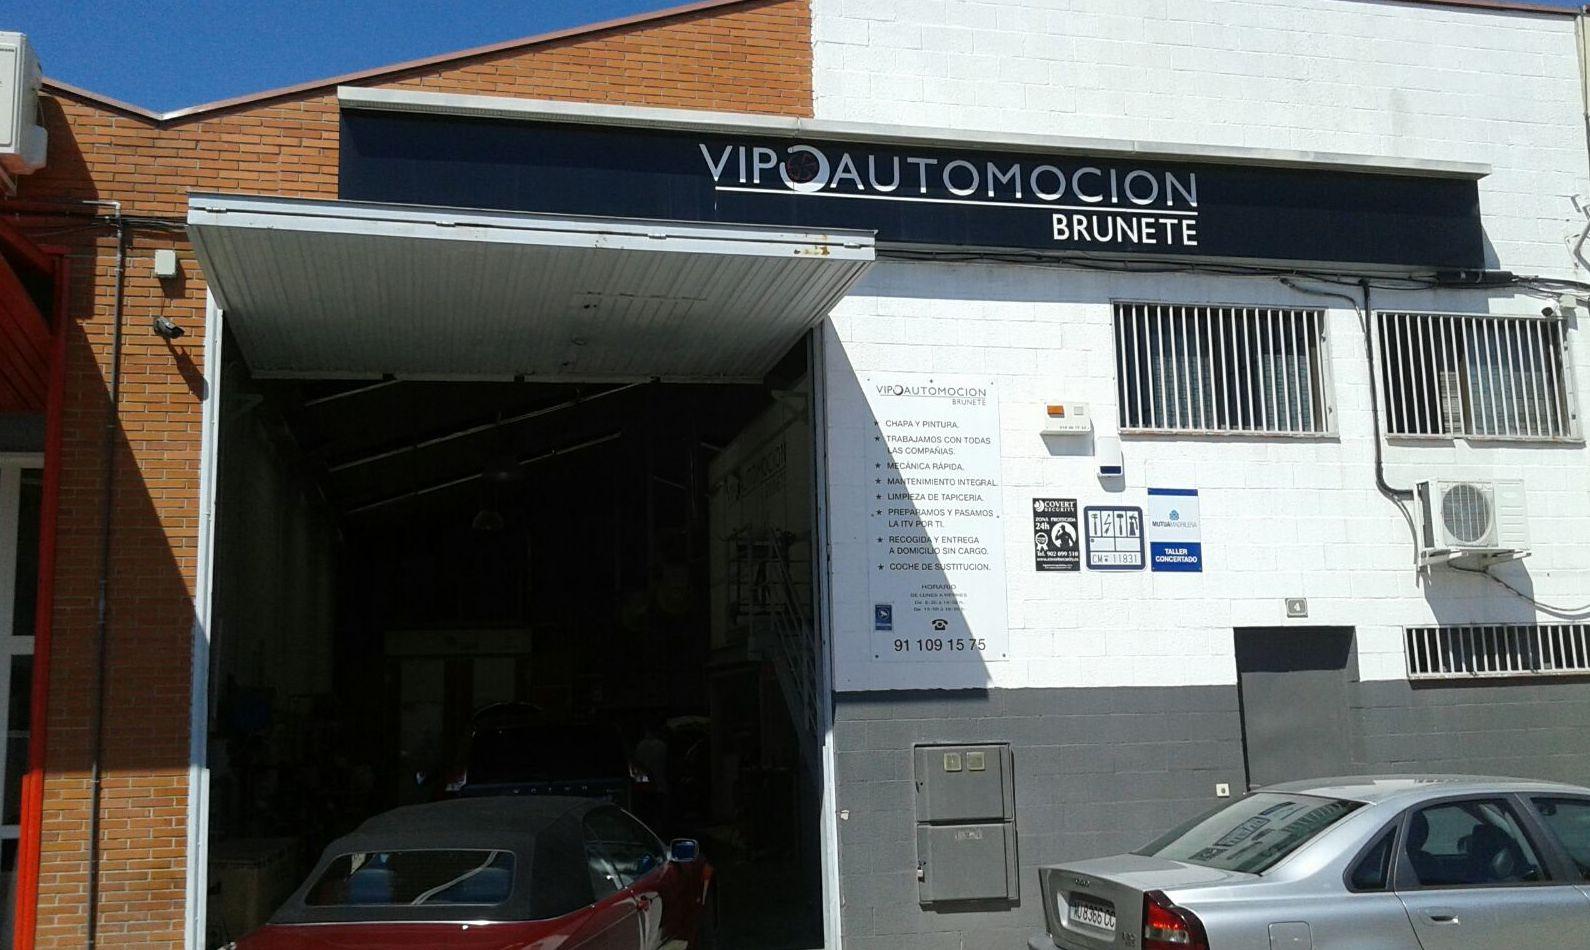 VIP AUTOMOCION BRUNETE